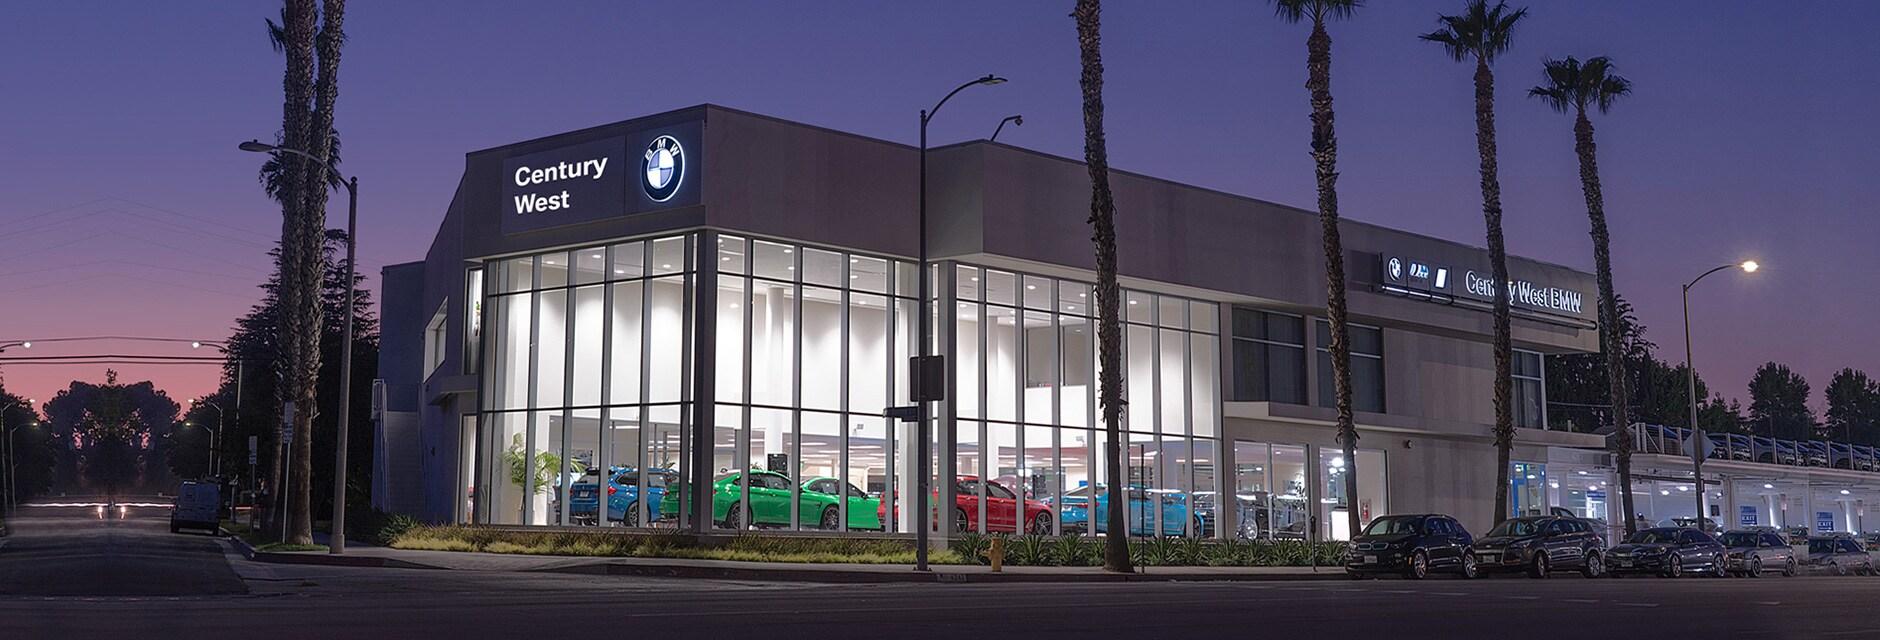 Bmw Dealerships Studio City >> Bmw Service At Century West Bmw Bmw Car Repair In Studio City Near